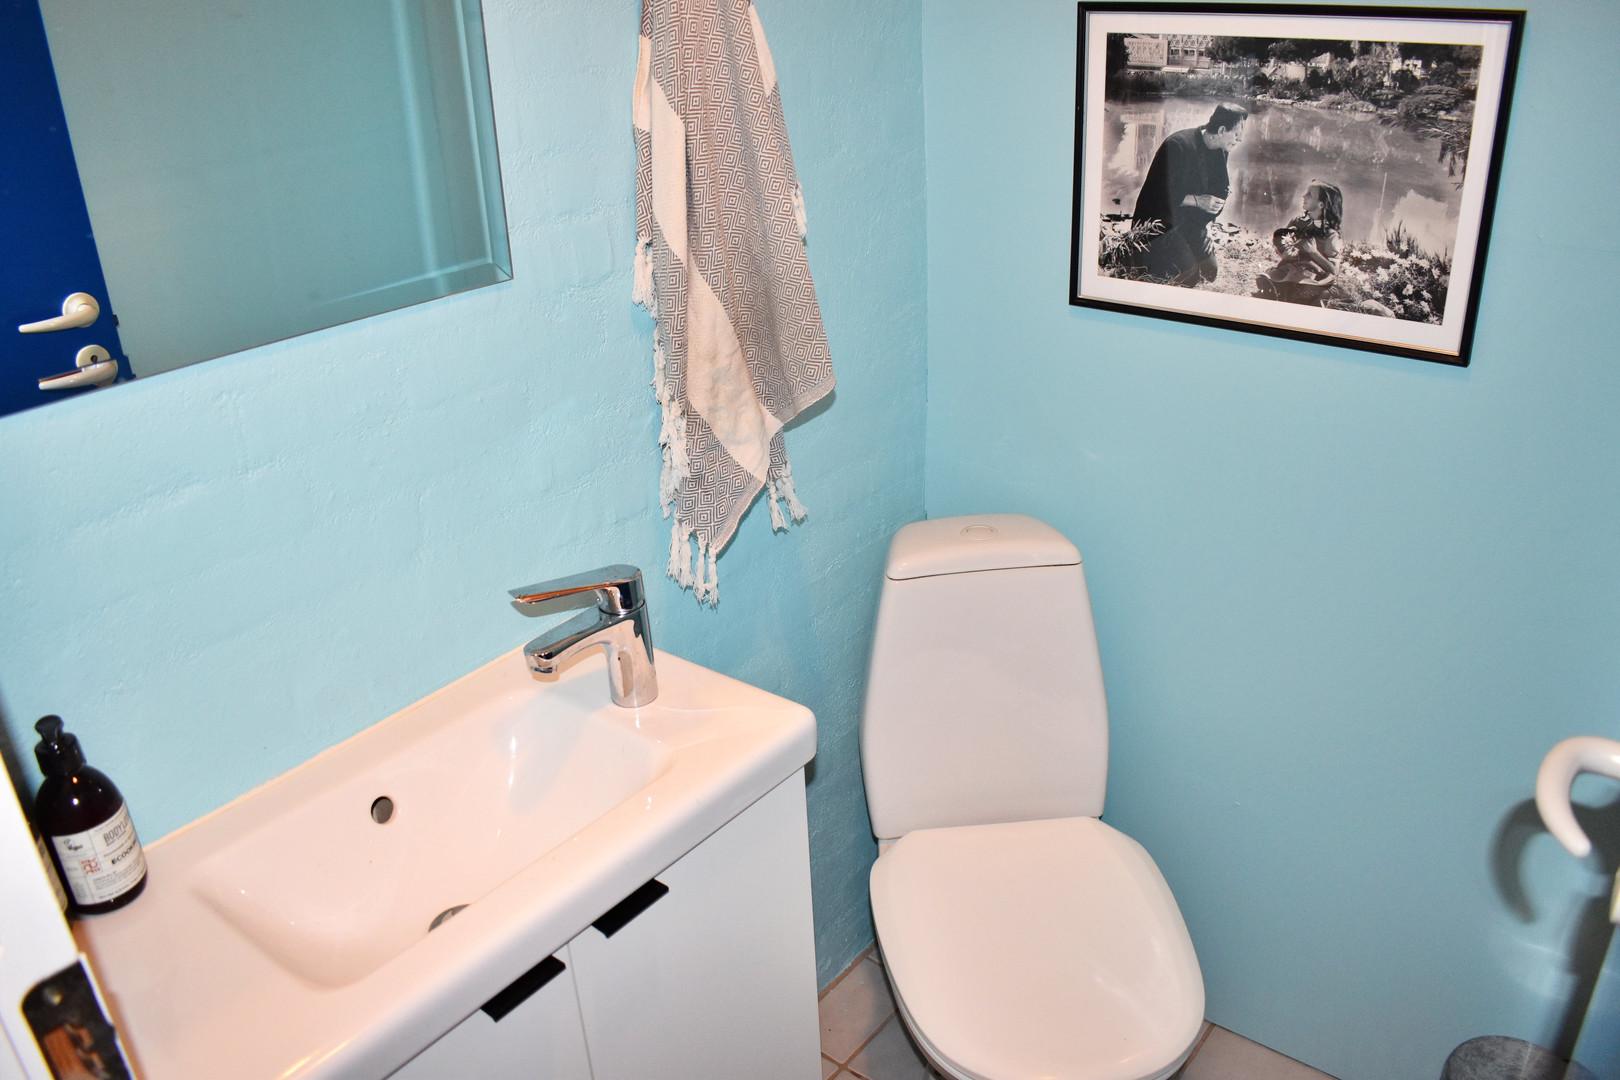 lille lukket toiletCAP_3424-min.JPG